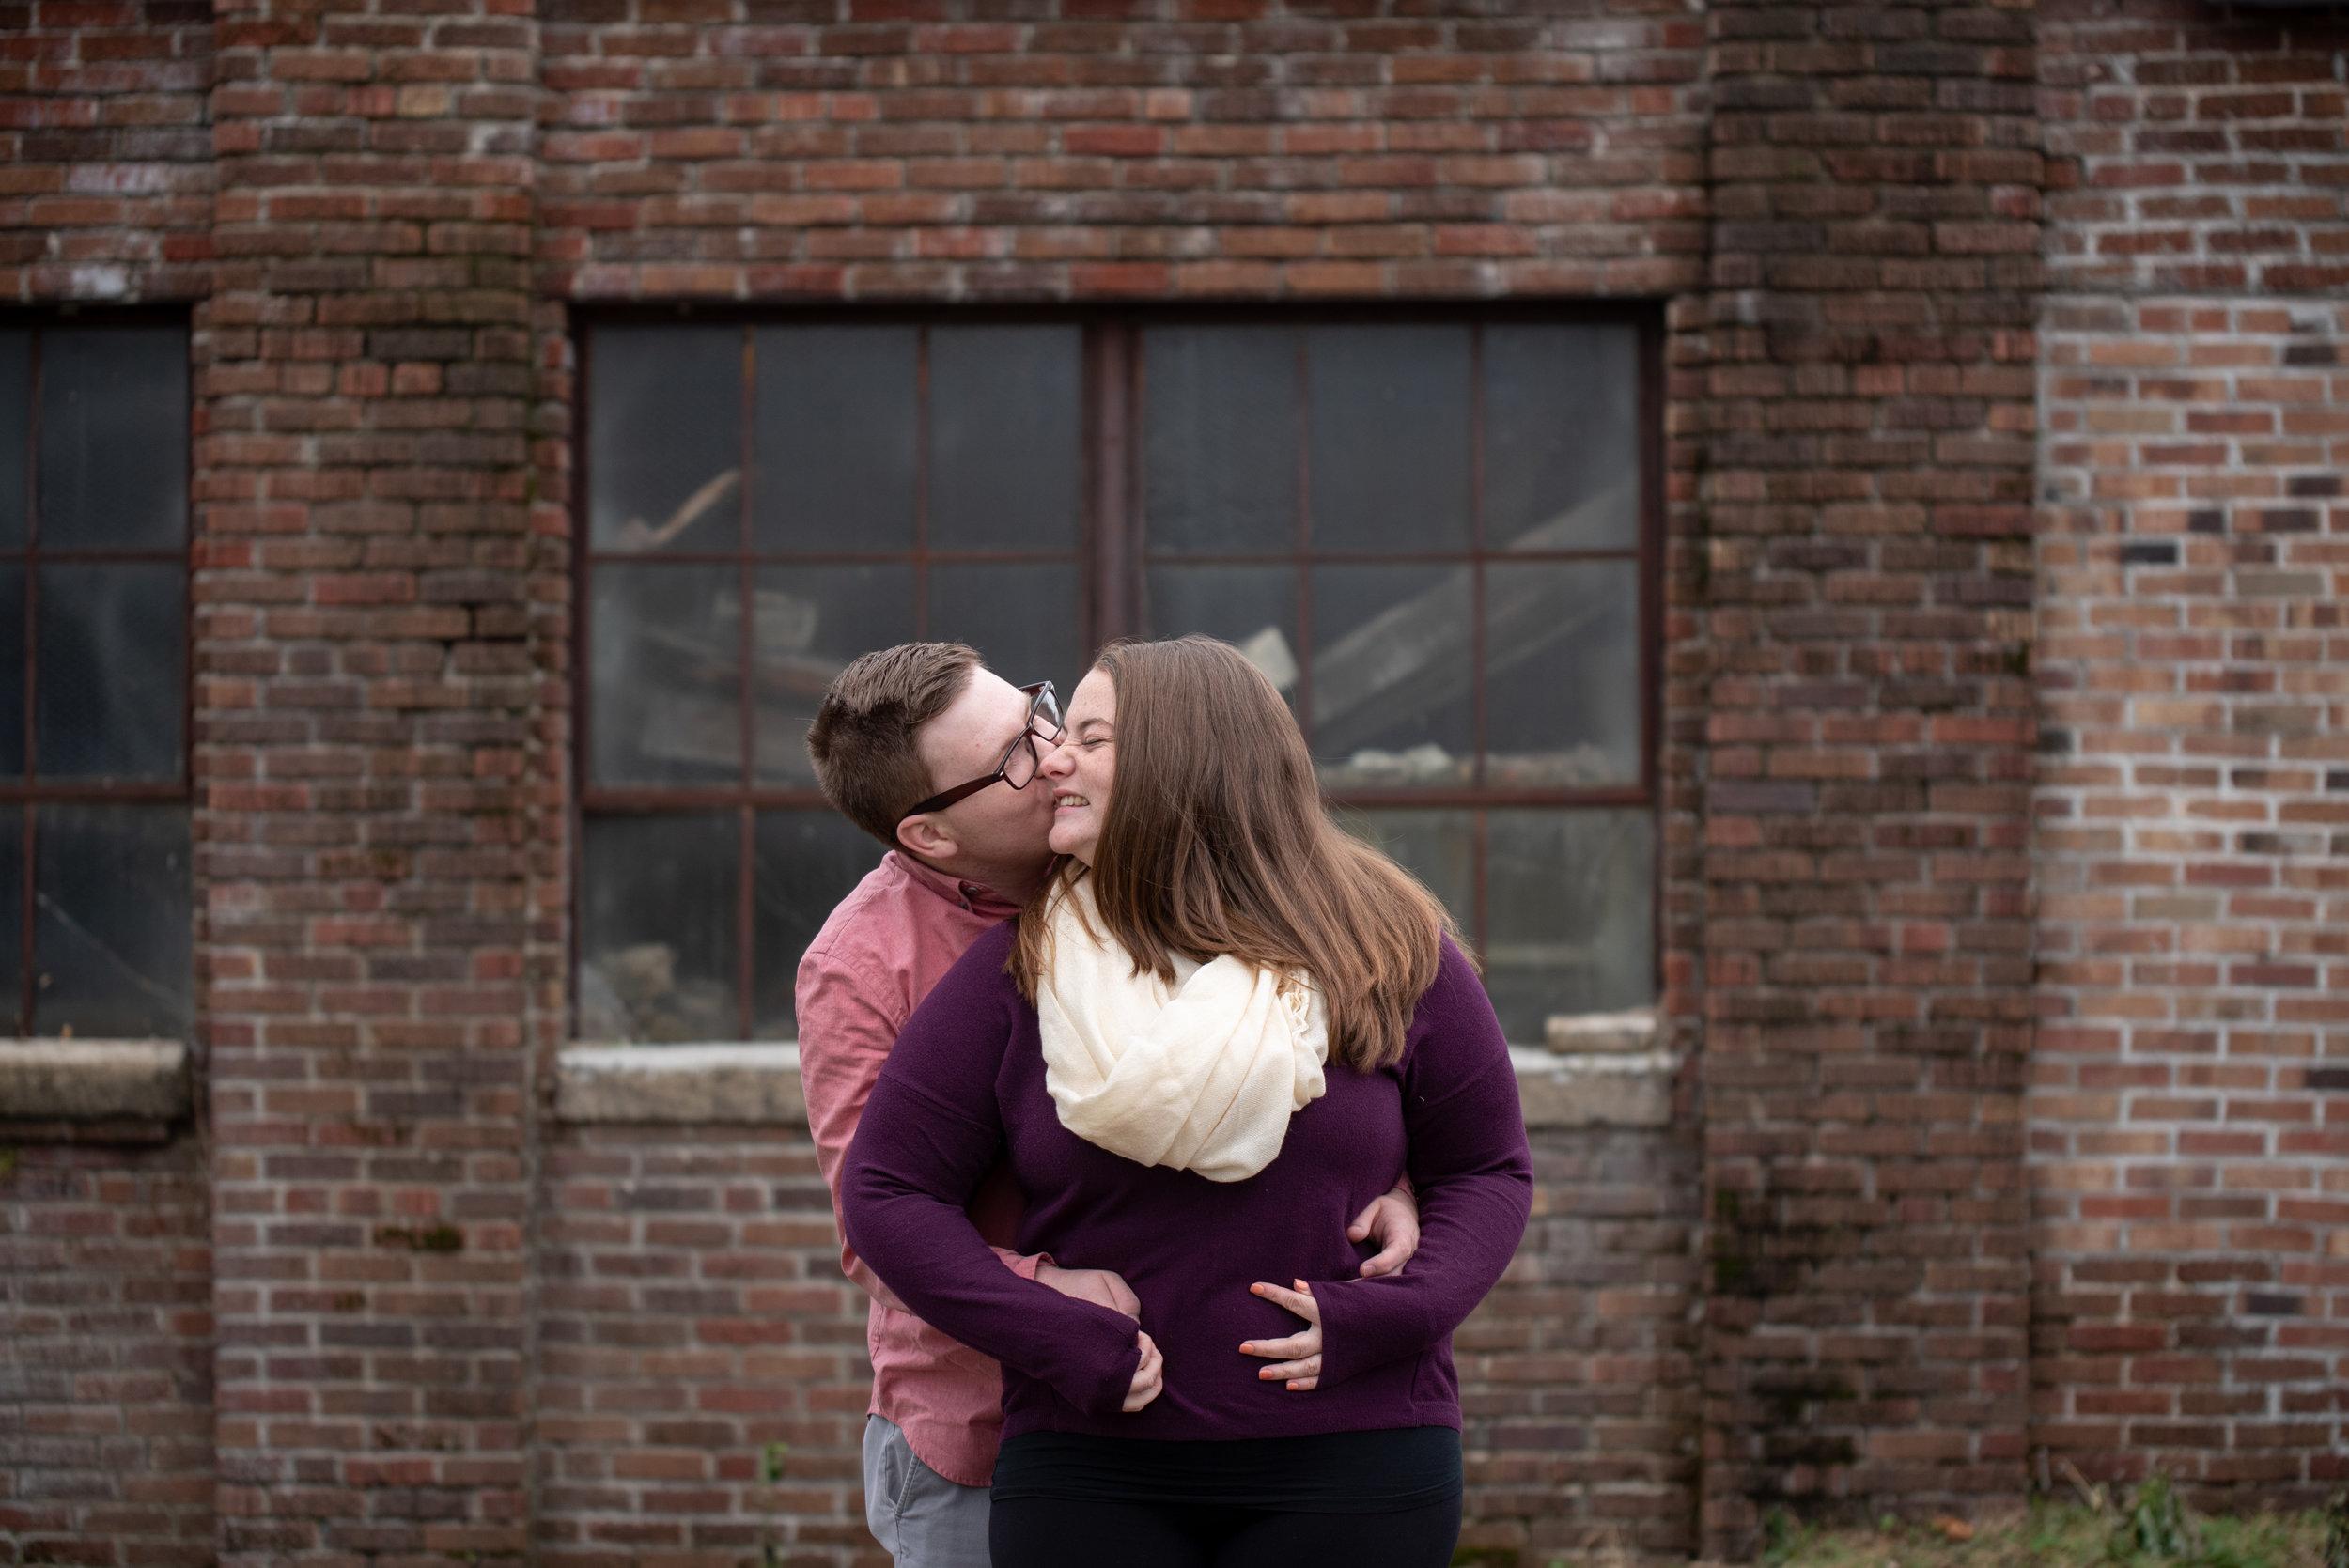 Bear Creative Co, Columbus Ohio Photographer, Columbus Ohio Wedding Photographer, Engagement Session, Canal Winchester Ohio, NorthStar Golf Course